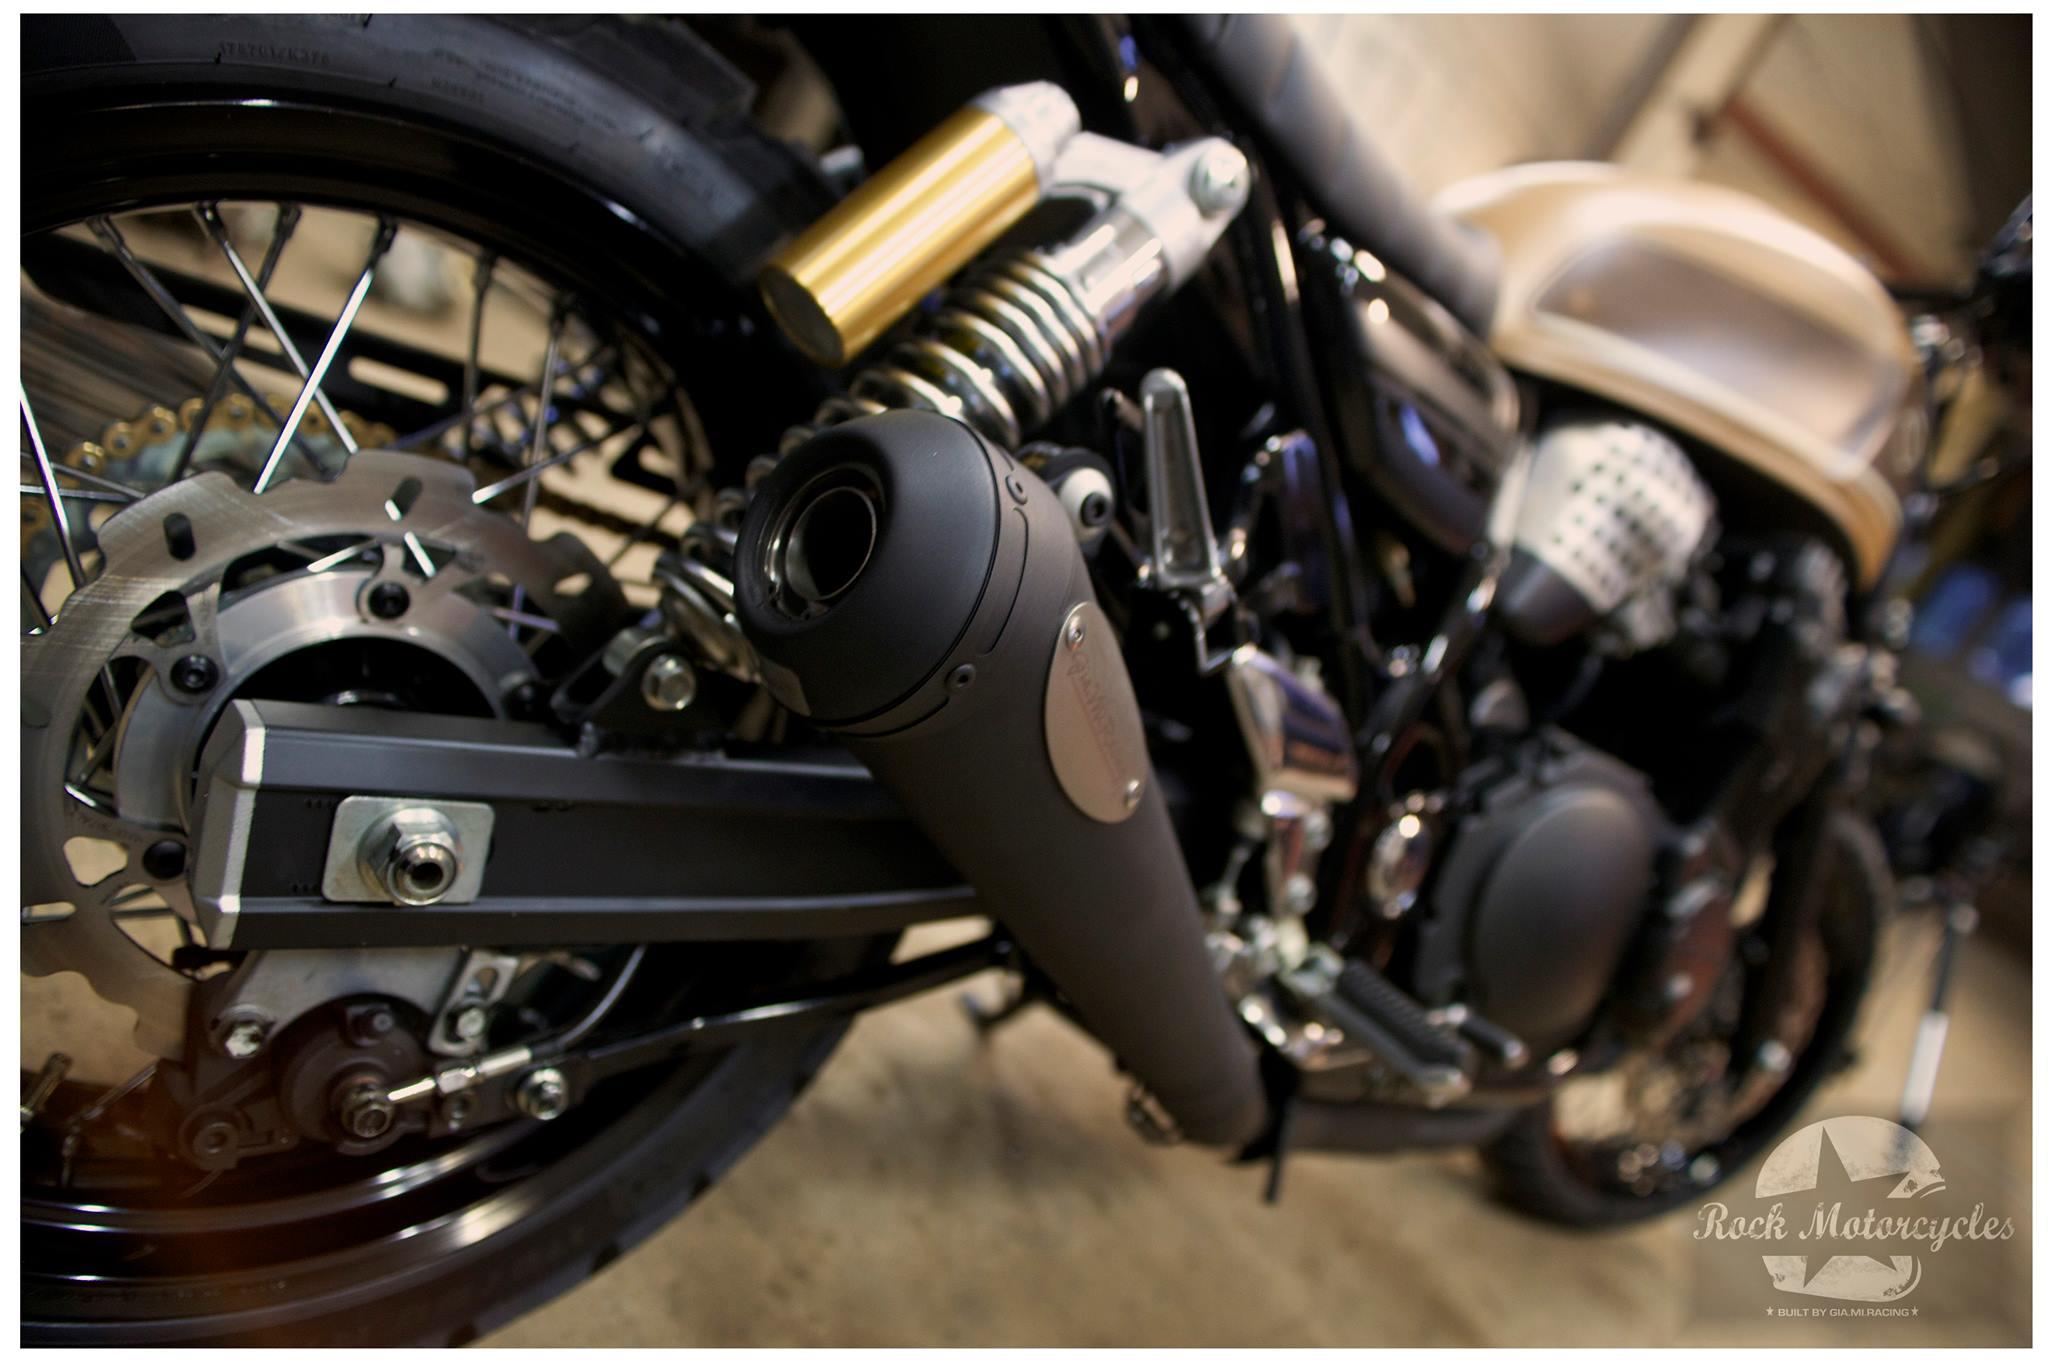 Suzuki 750 Inazuma Scrambler By Rock Motorcycles